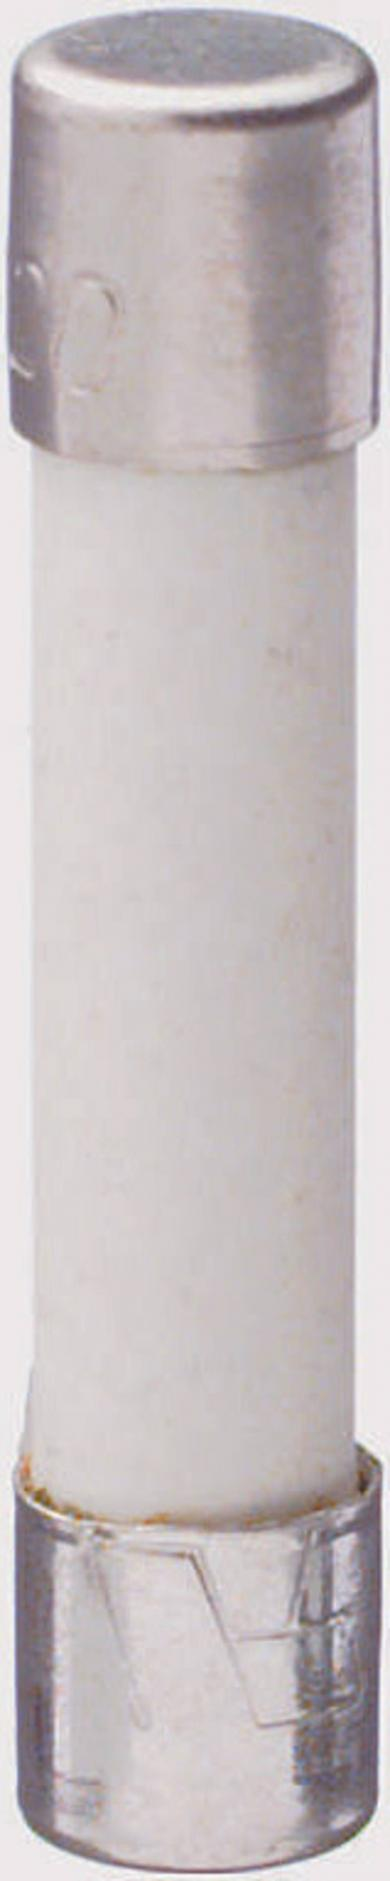 Siguranţă 6,4 x 31,8 mm ultrarapidă -FF- Eska tip GBB, 250 V/AC, 125 V/DC, 10 A